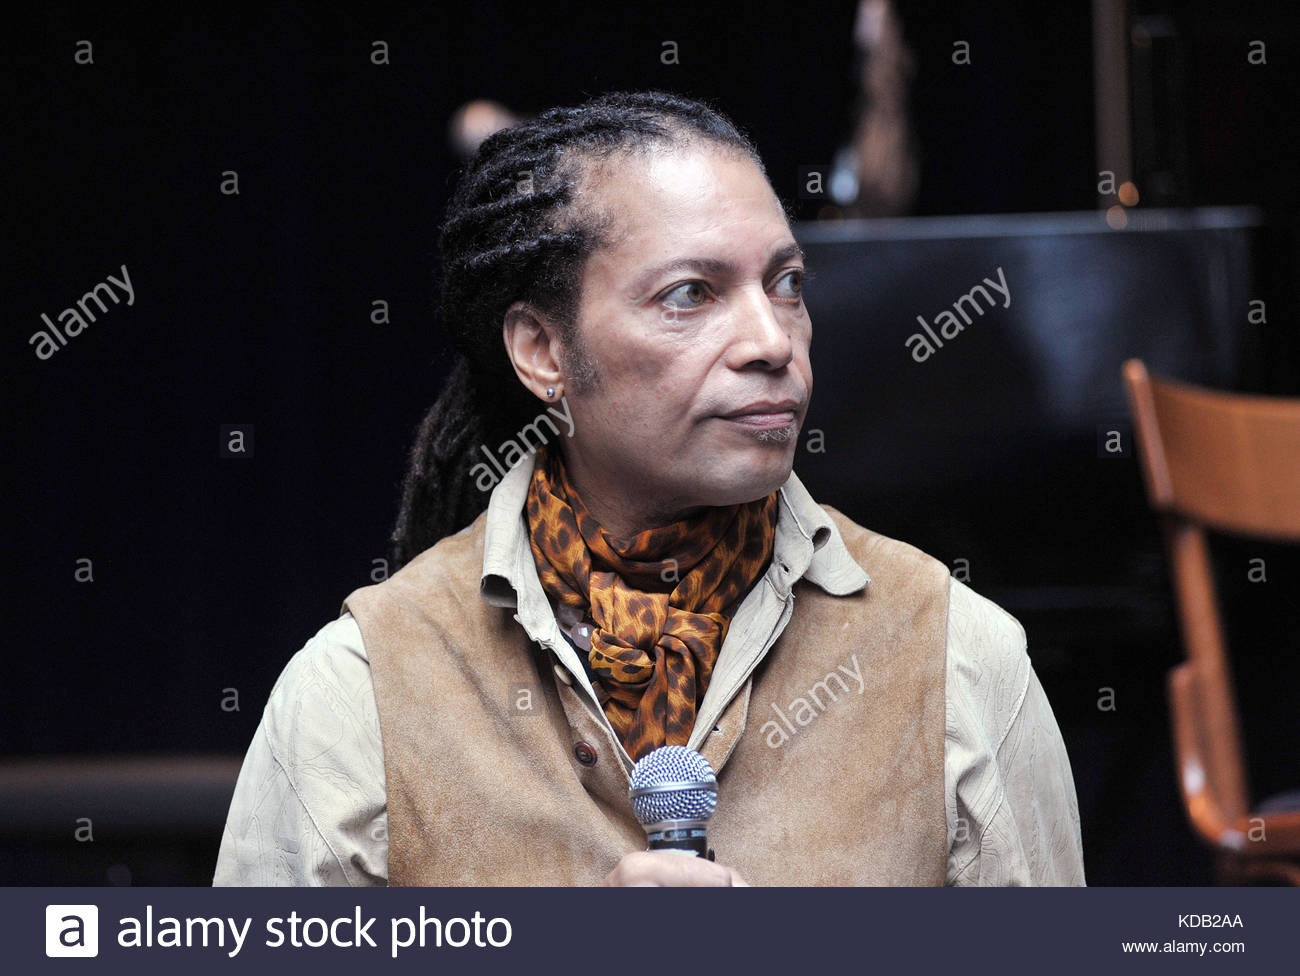 Sananda Maitreya Precedentemente Noto Come Terence Trent D Arby Presenta Il Nuovo Album Prometheus And Pandora Milano 11 10 2017 Foto Stock Alamy